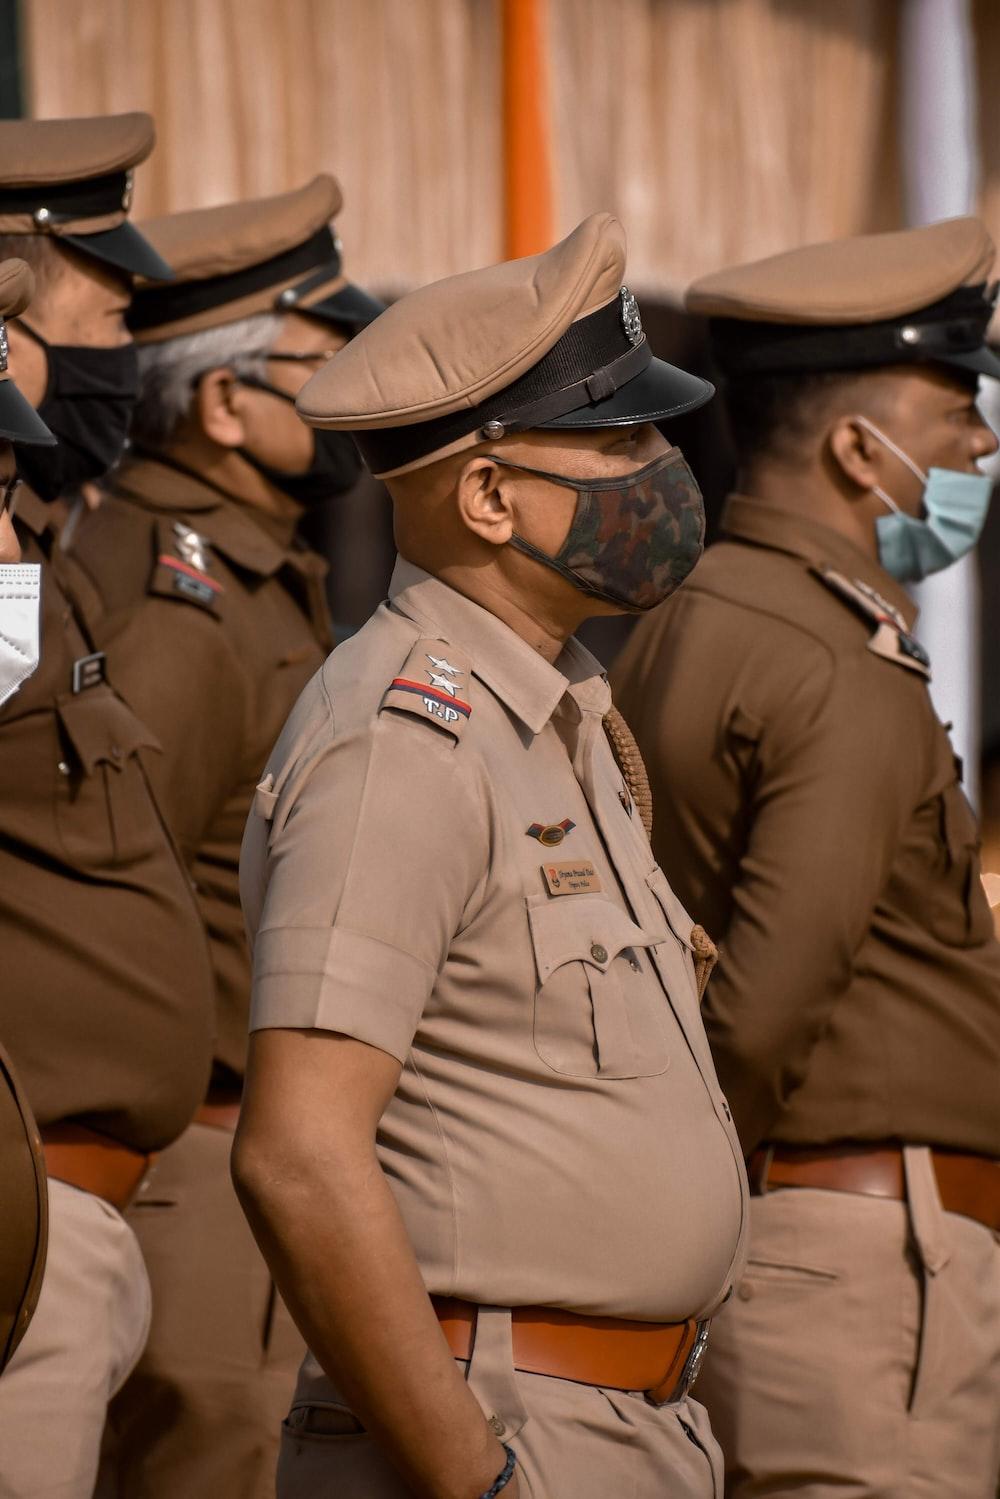 man in brown uniform sitting on chair